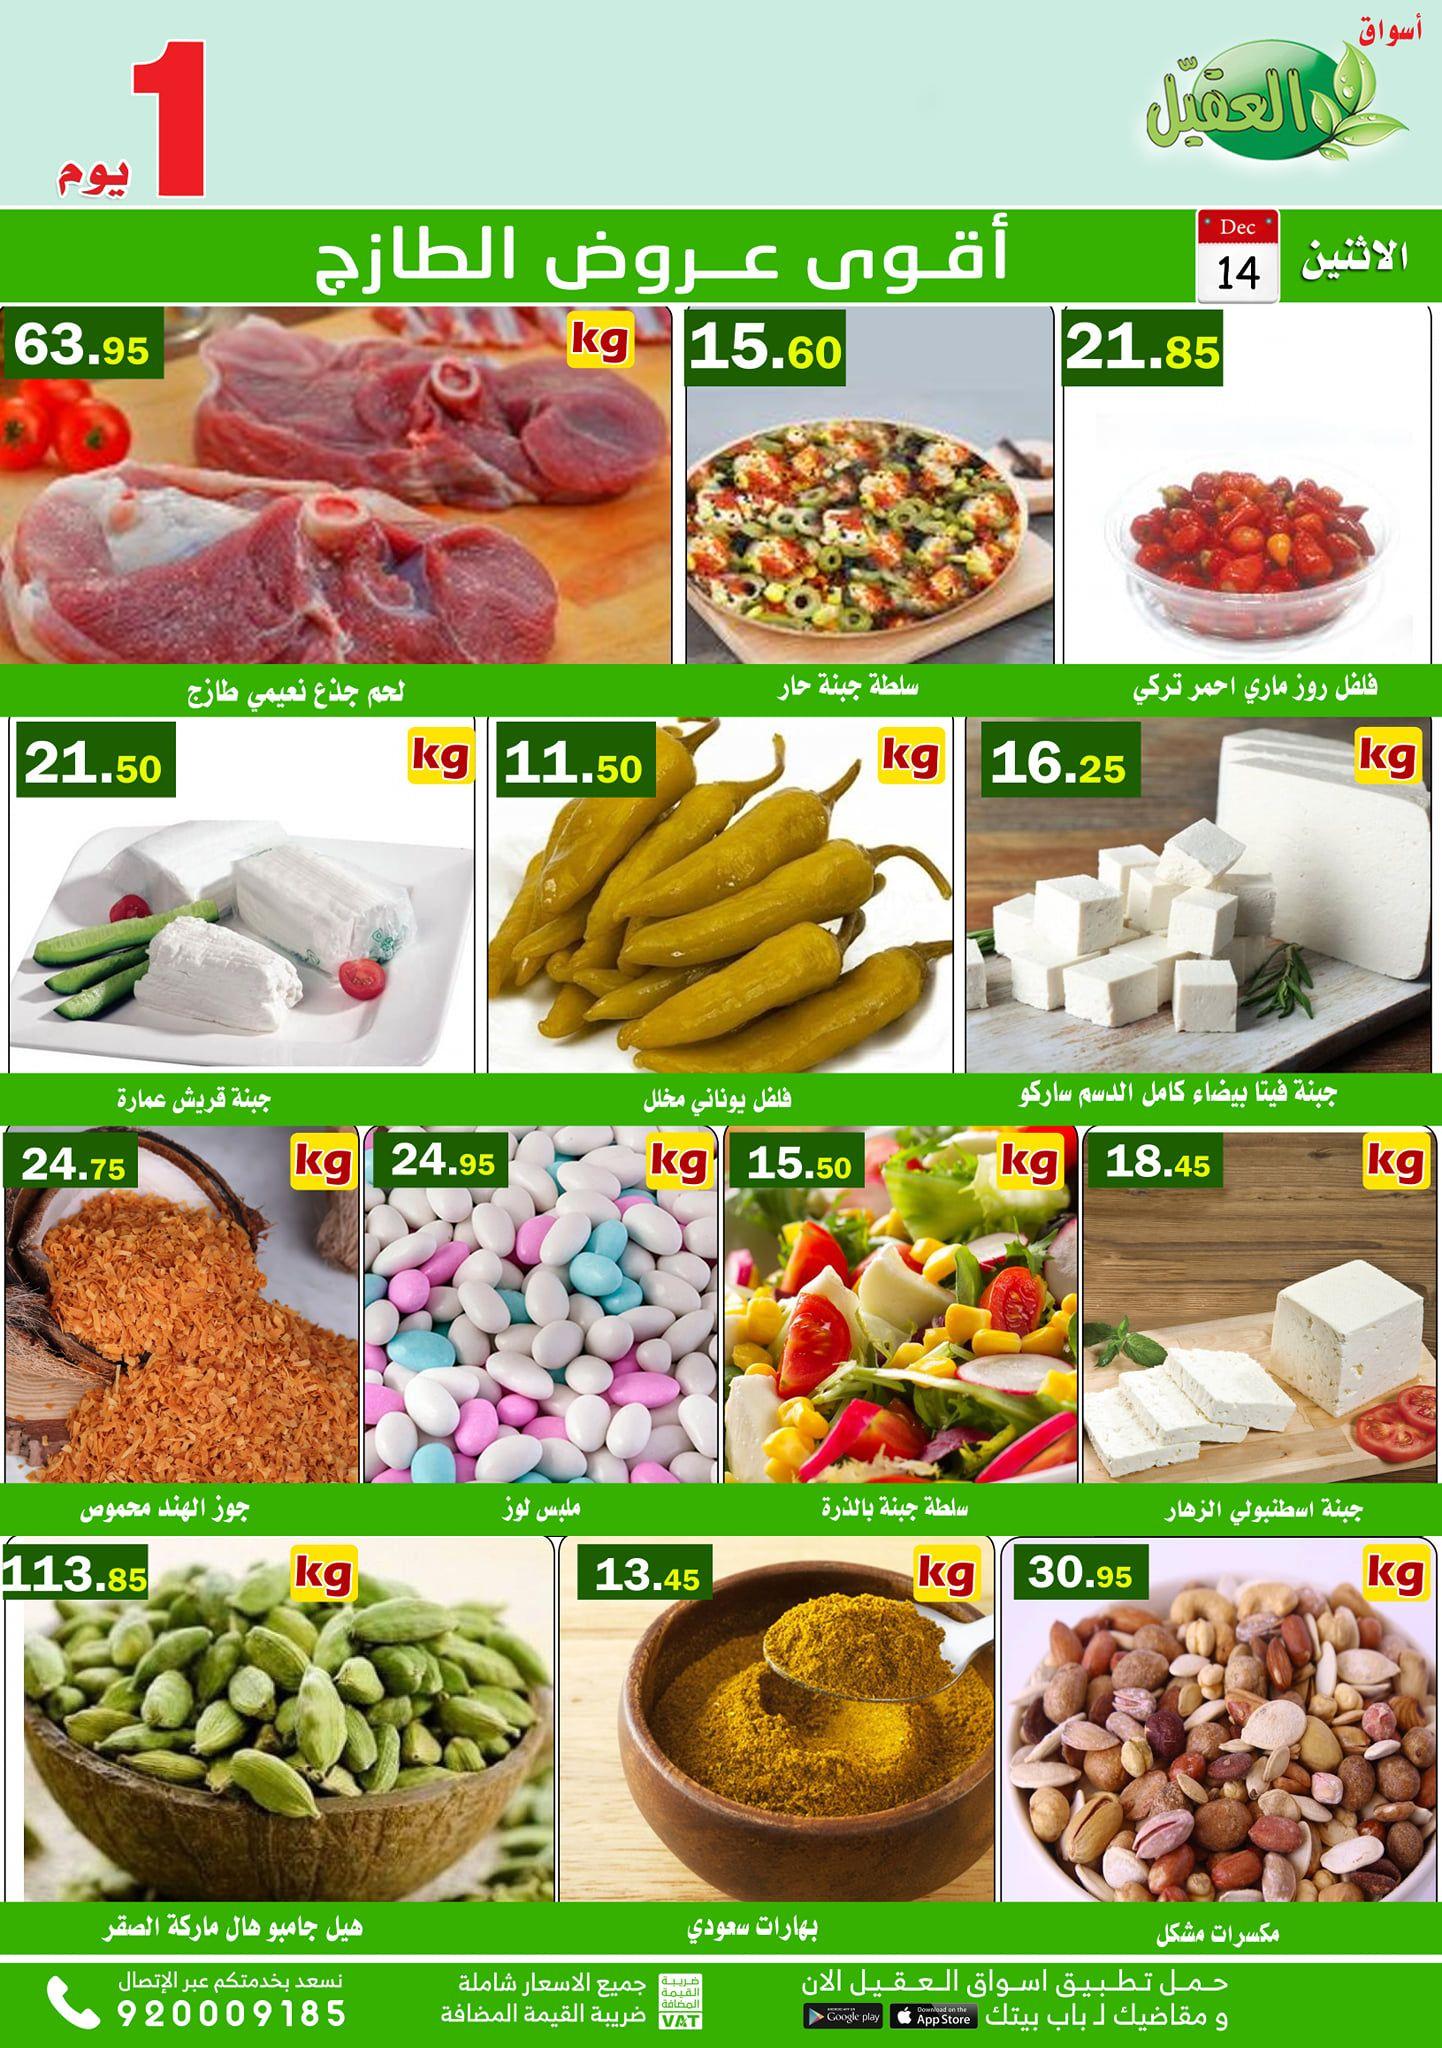 Pin By Soouq Sudia On عروض اسواق العقيل Food Vegetables Green Beans